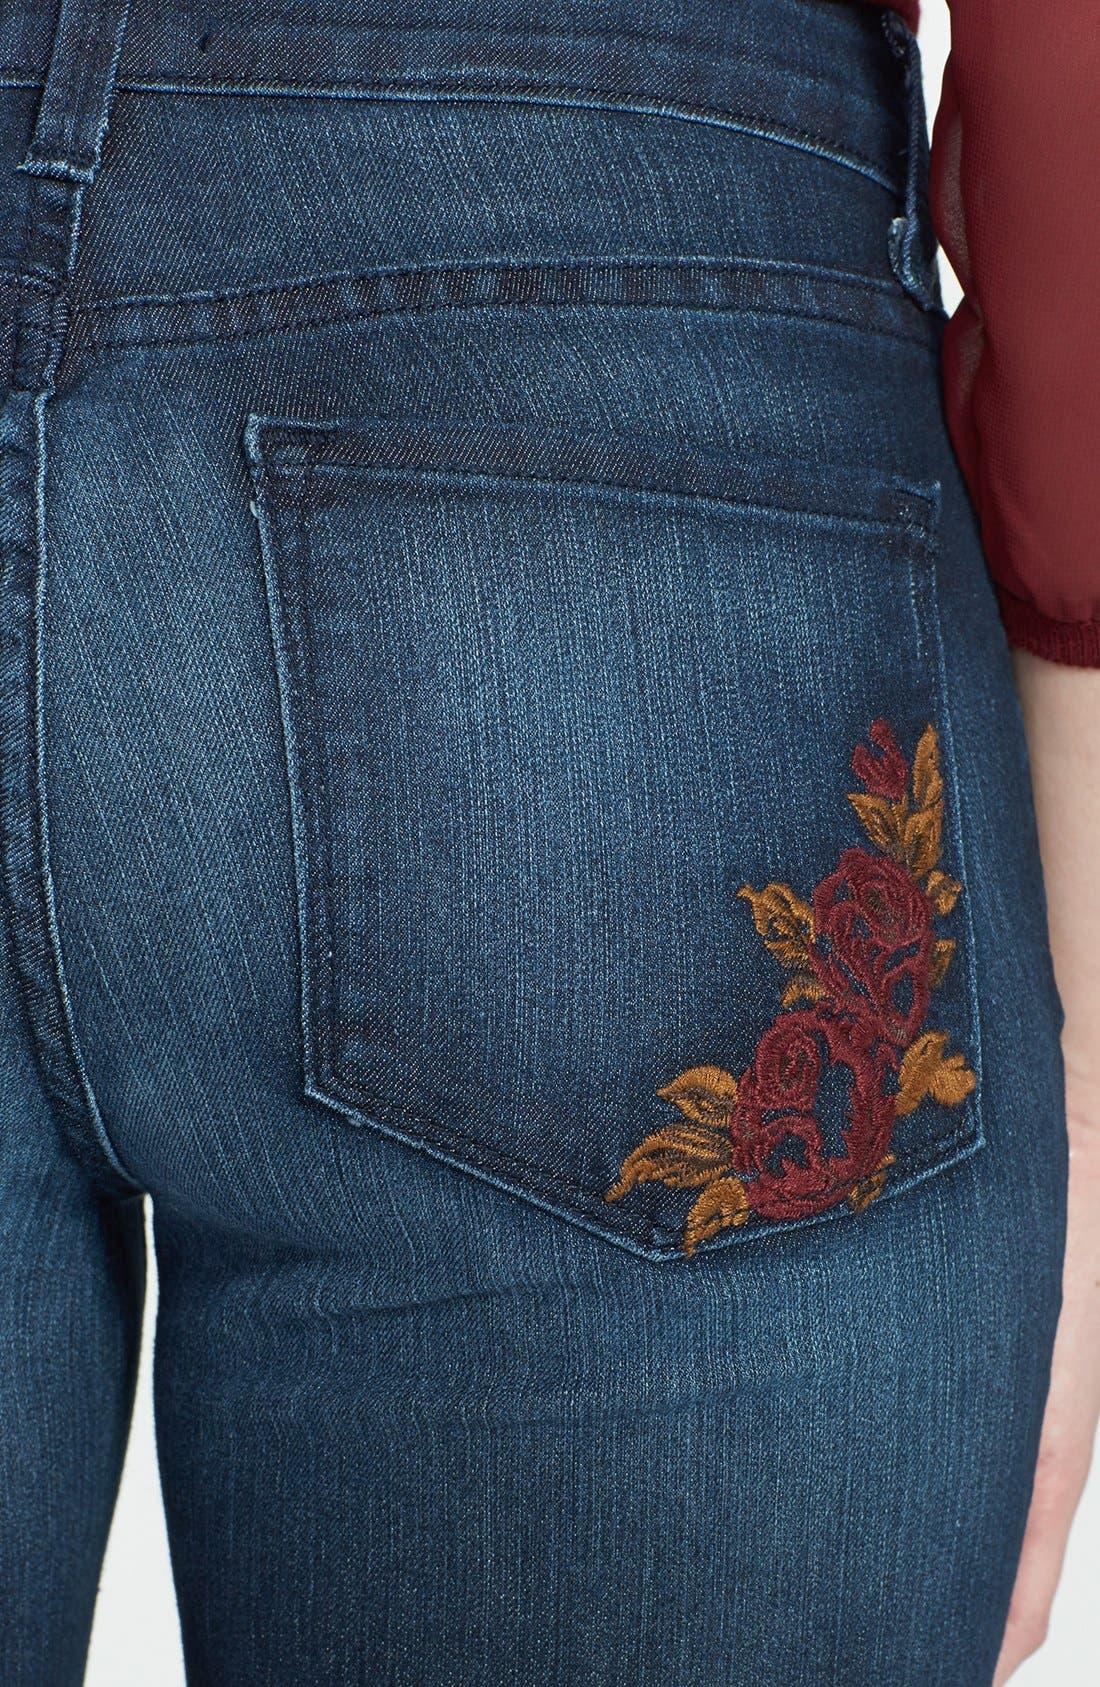 Alternate Image 3  - NYDJ 'Marilyn' Stretch Straight Leg Jeans (Dana Point)